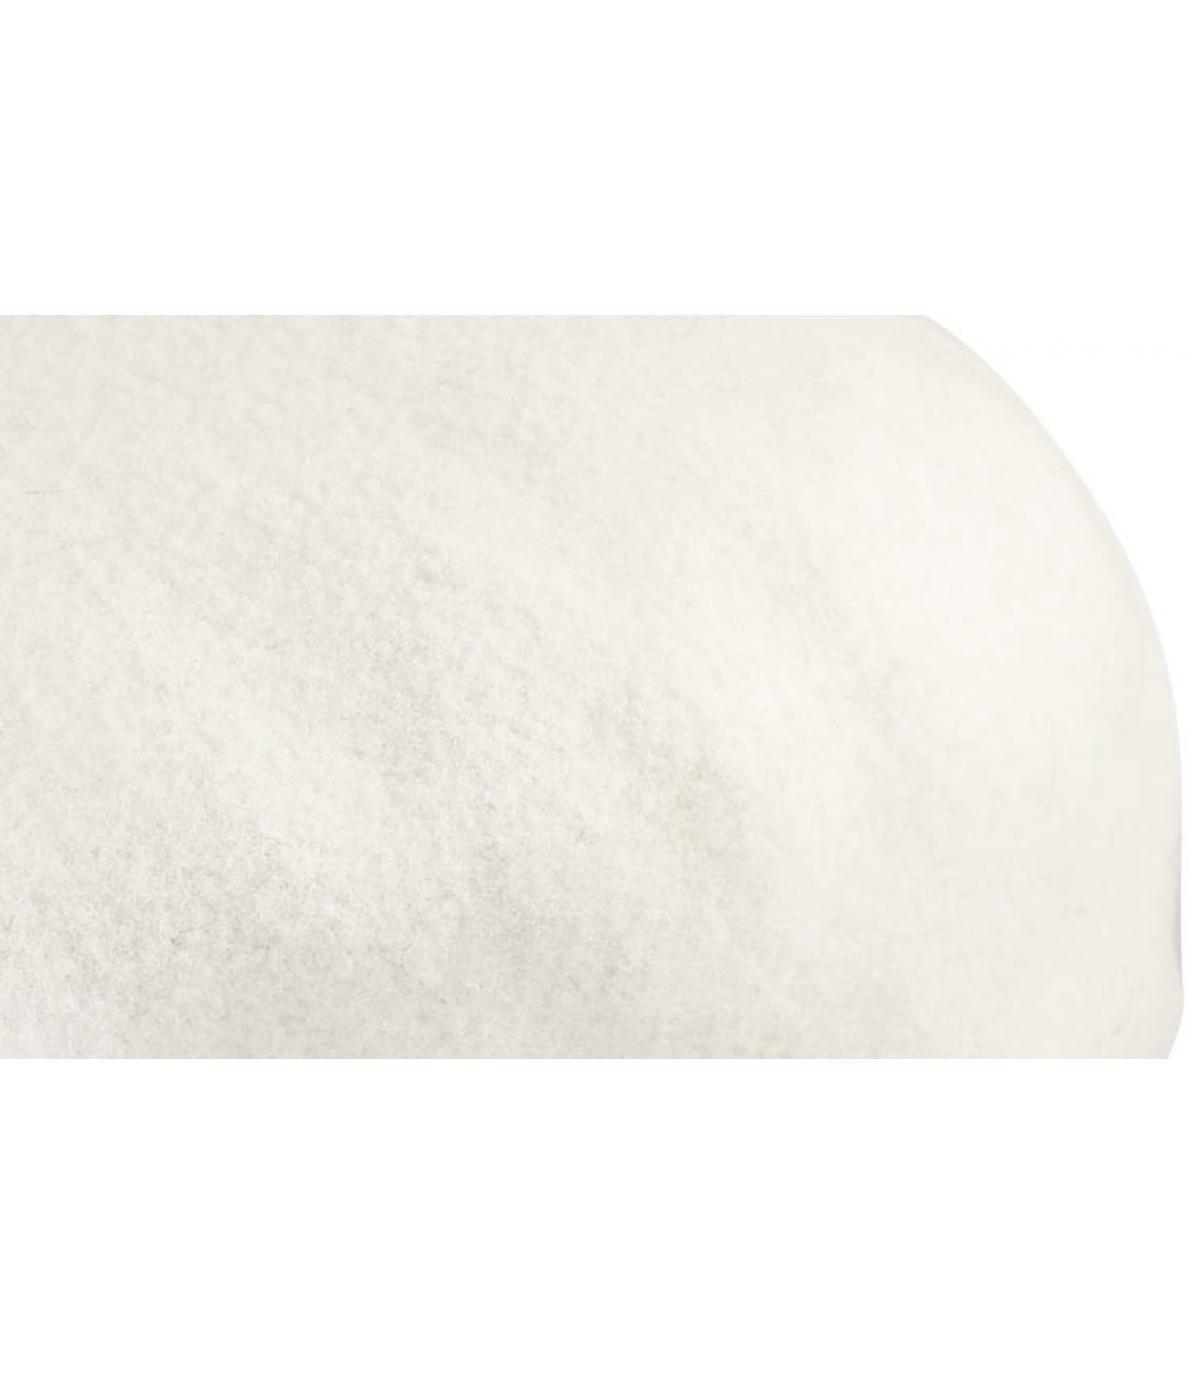 Détails 504 wool white - image 2